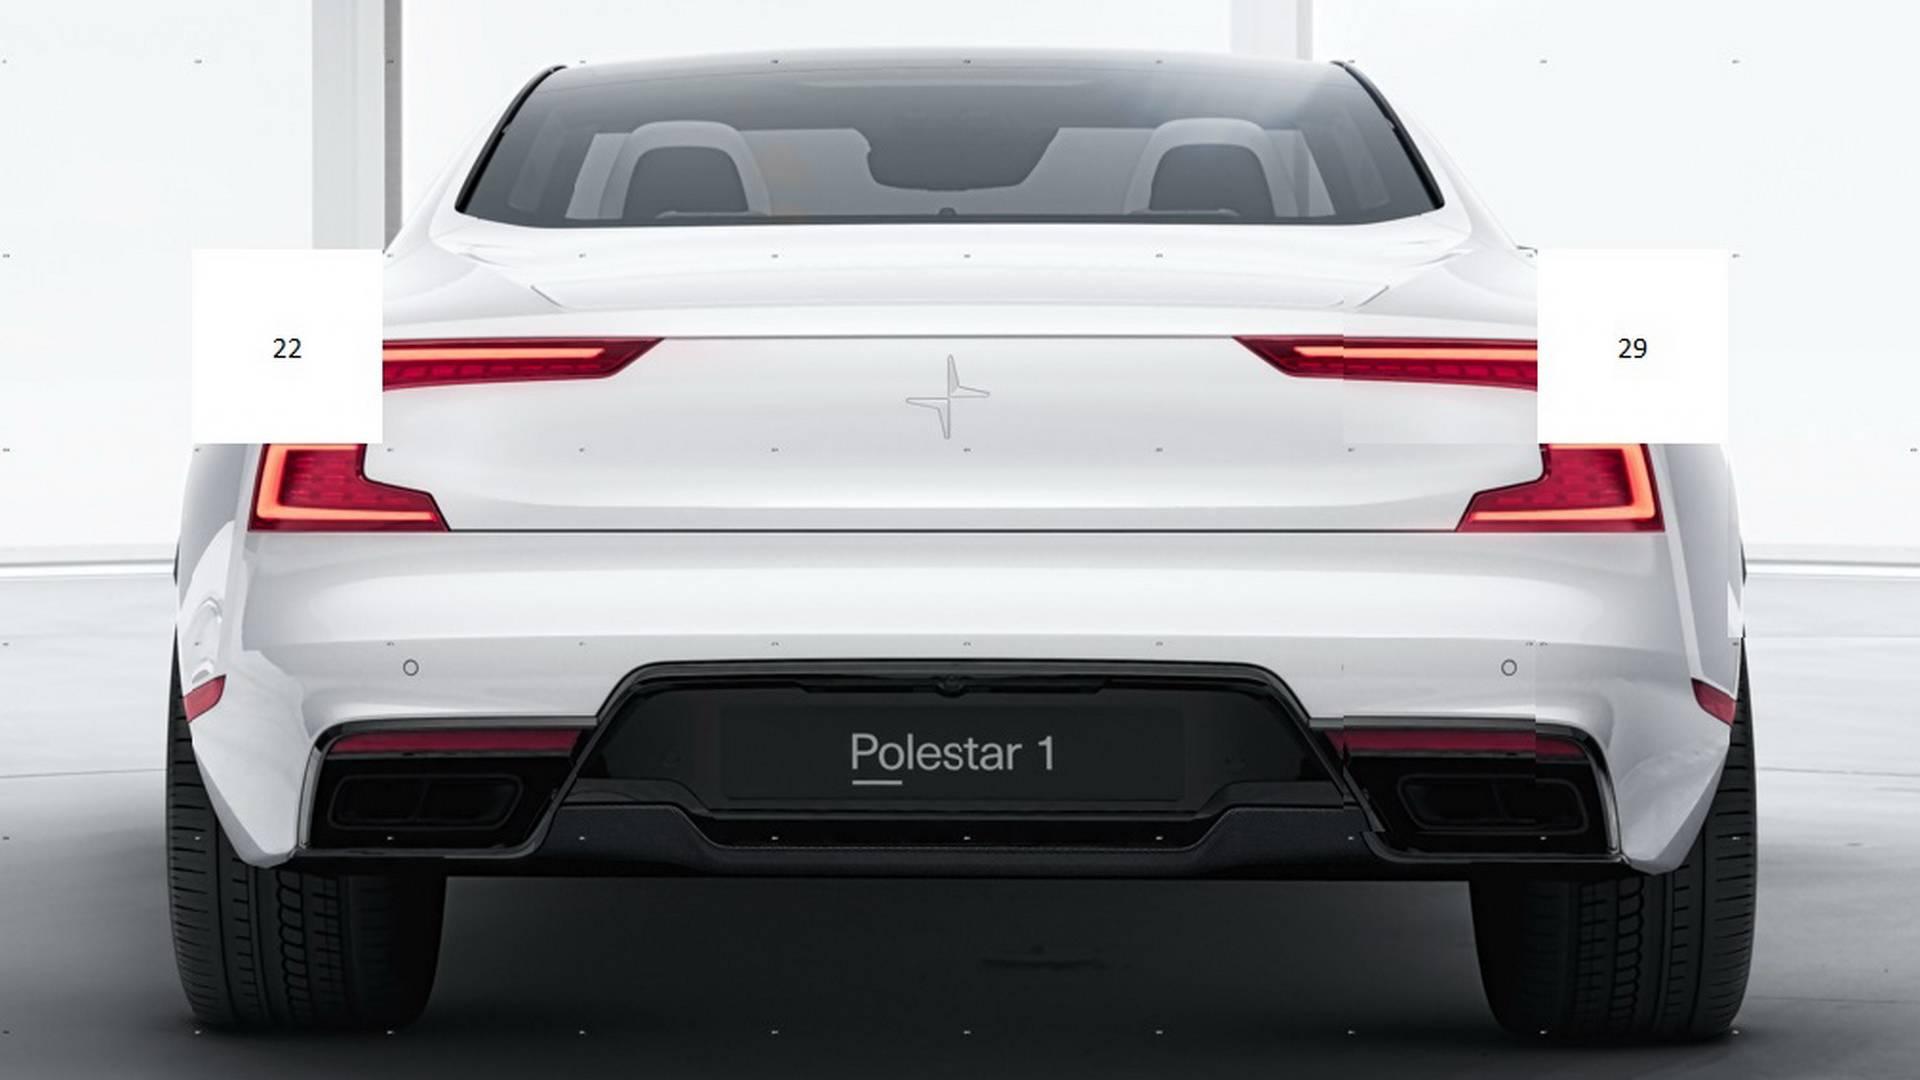 Polestar S First Car Previewed Again Looks Fat